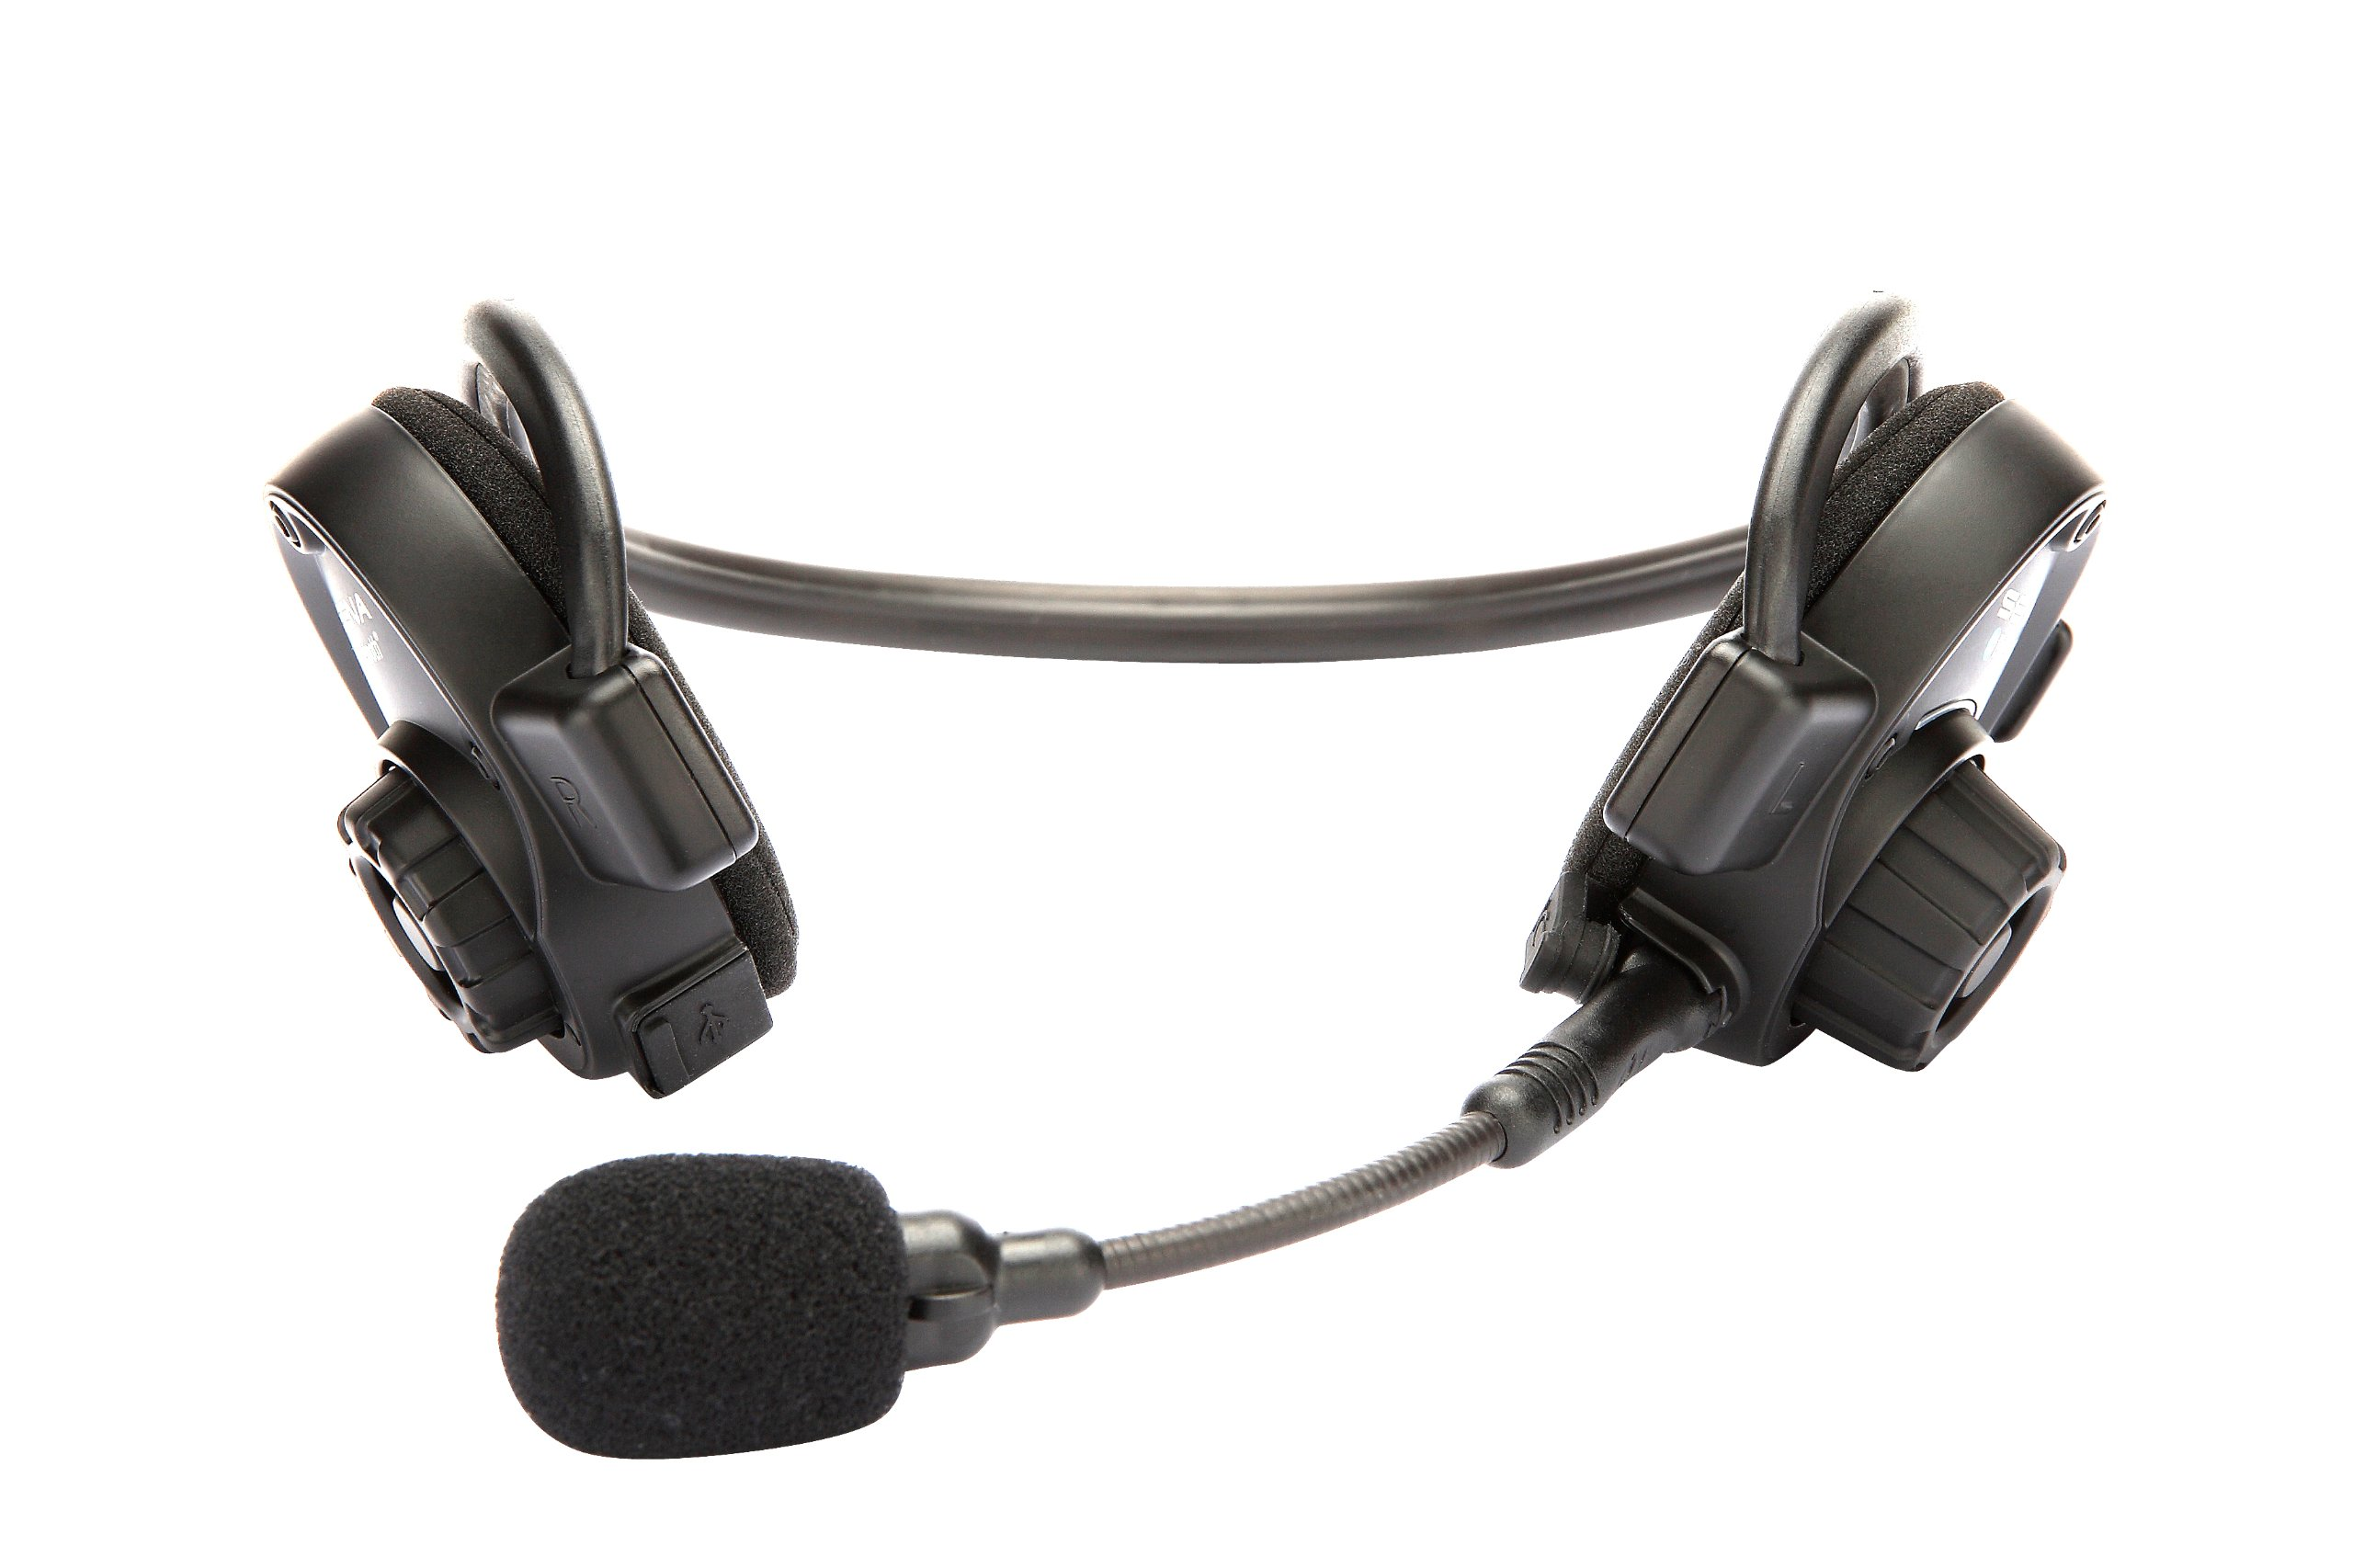 Sena SPH10-10 Outdoor Sports Bluetooth Stereo Headset / Intercom by Sena (Image #2)